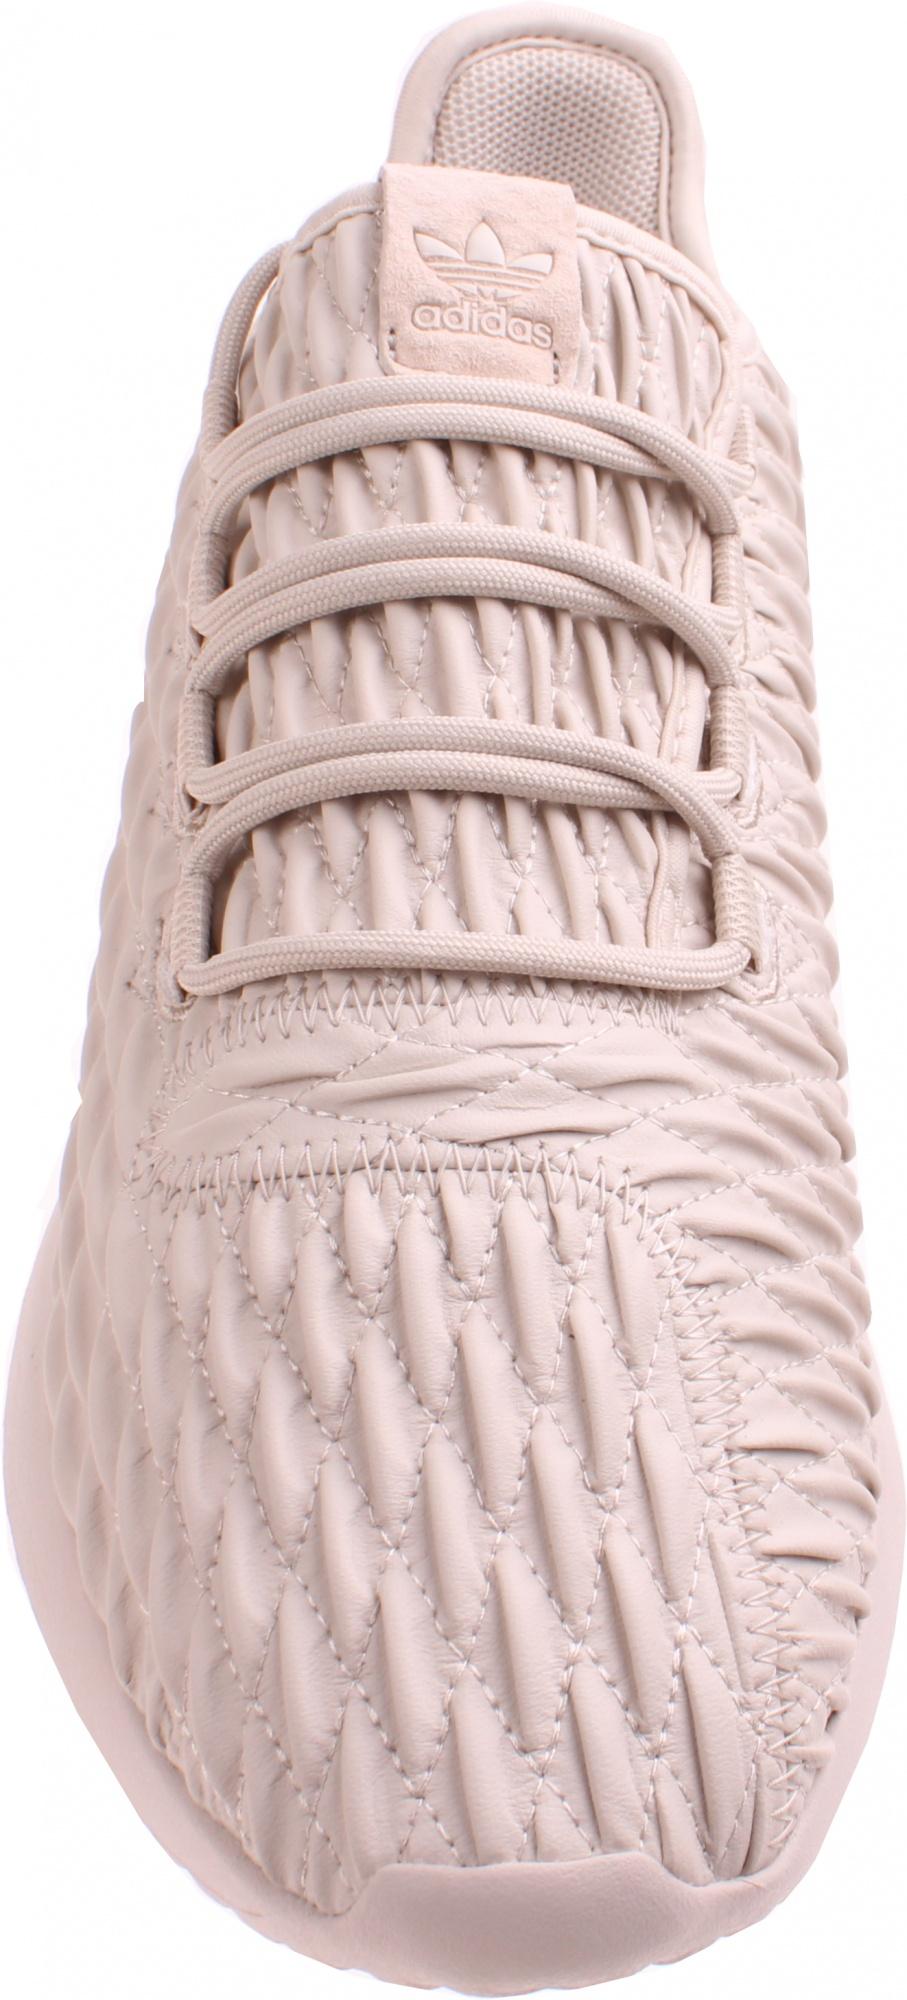 827fd8df1f15 adidas sneakers Tubular Shadow men beige - Internet-Sport Casuals